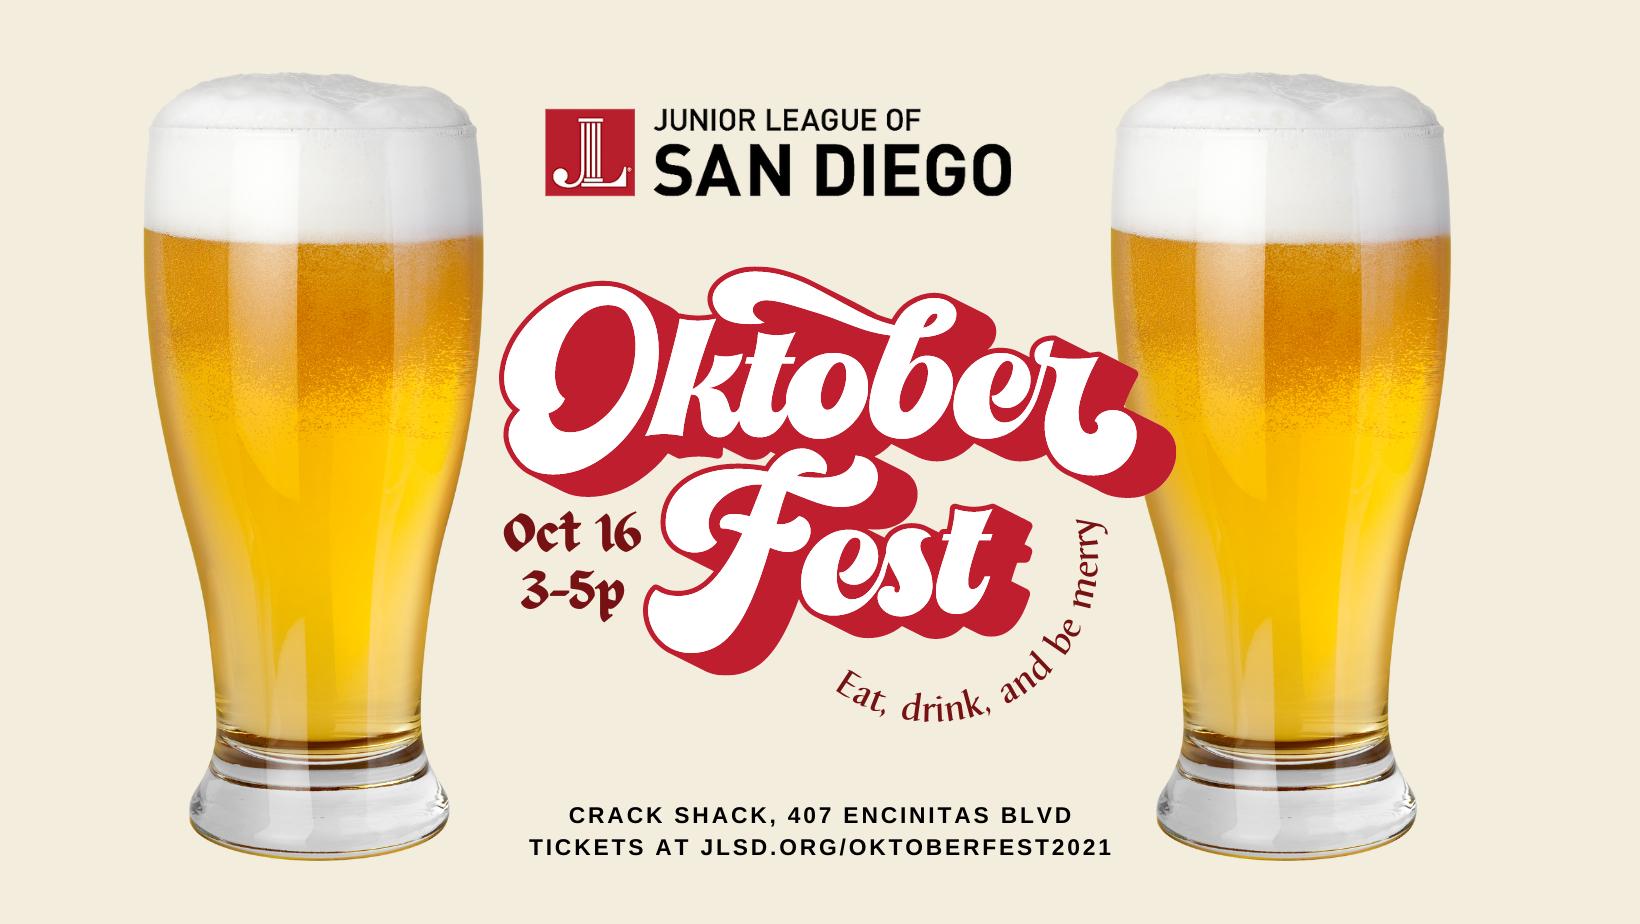 Junior League of San Diego Oktoberfest